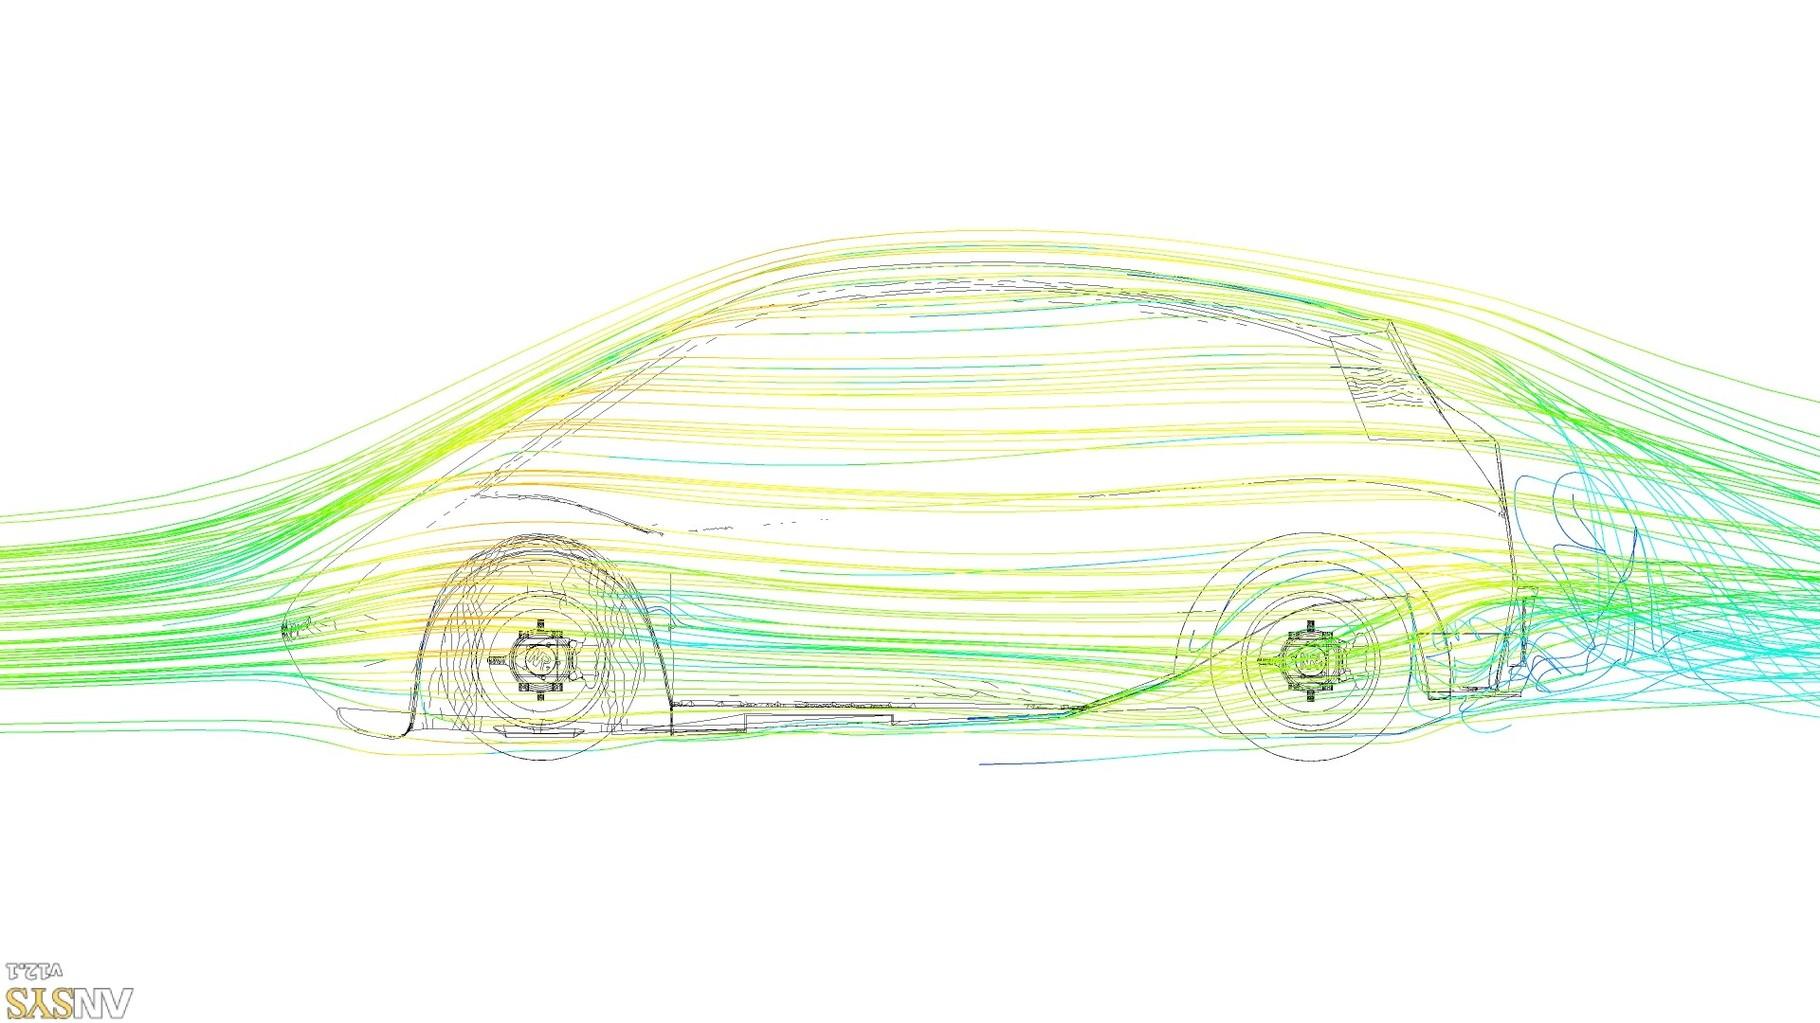 NR-1 Supermileage Car --200 Miles Per Gallon-- Virtual Wind Tunnel Testing